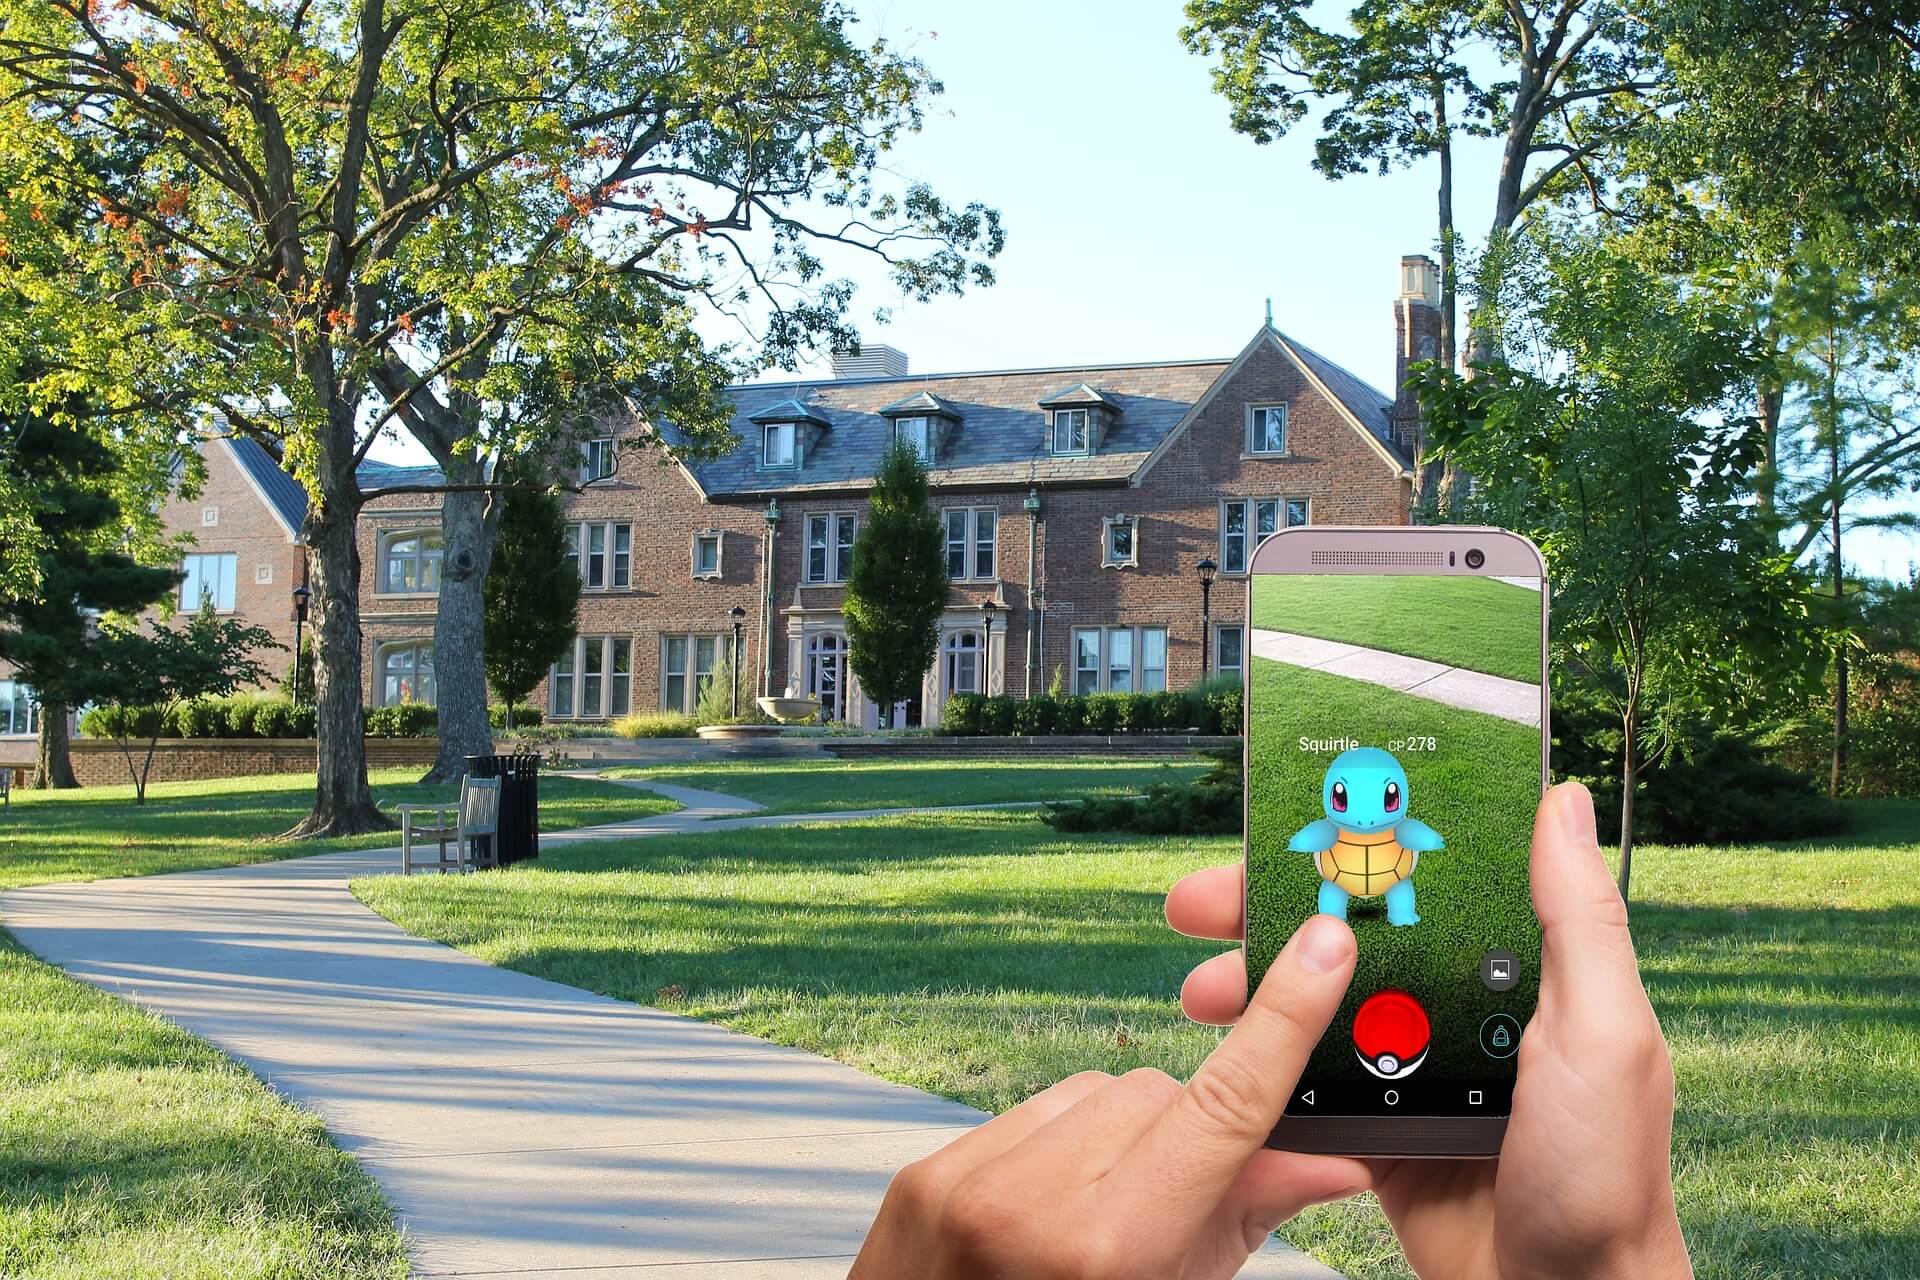 Augmented Reality mit pokemon go auf dem Smartphone